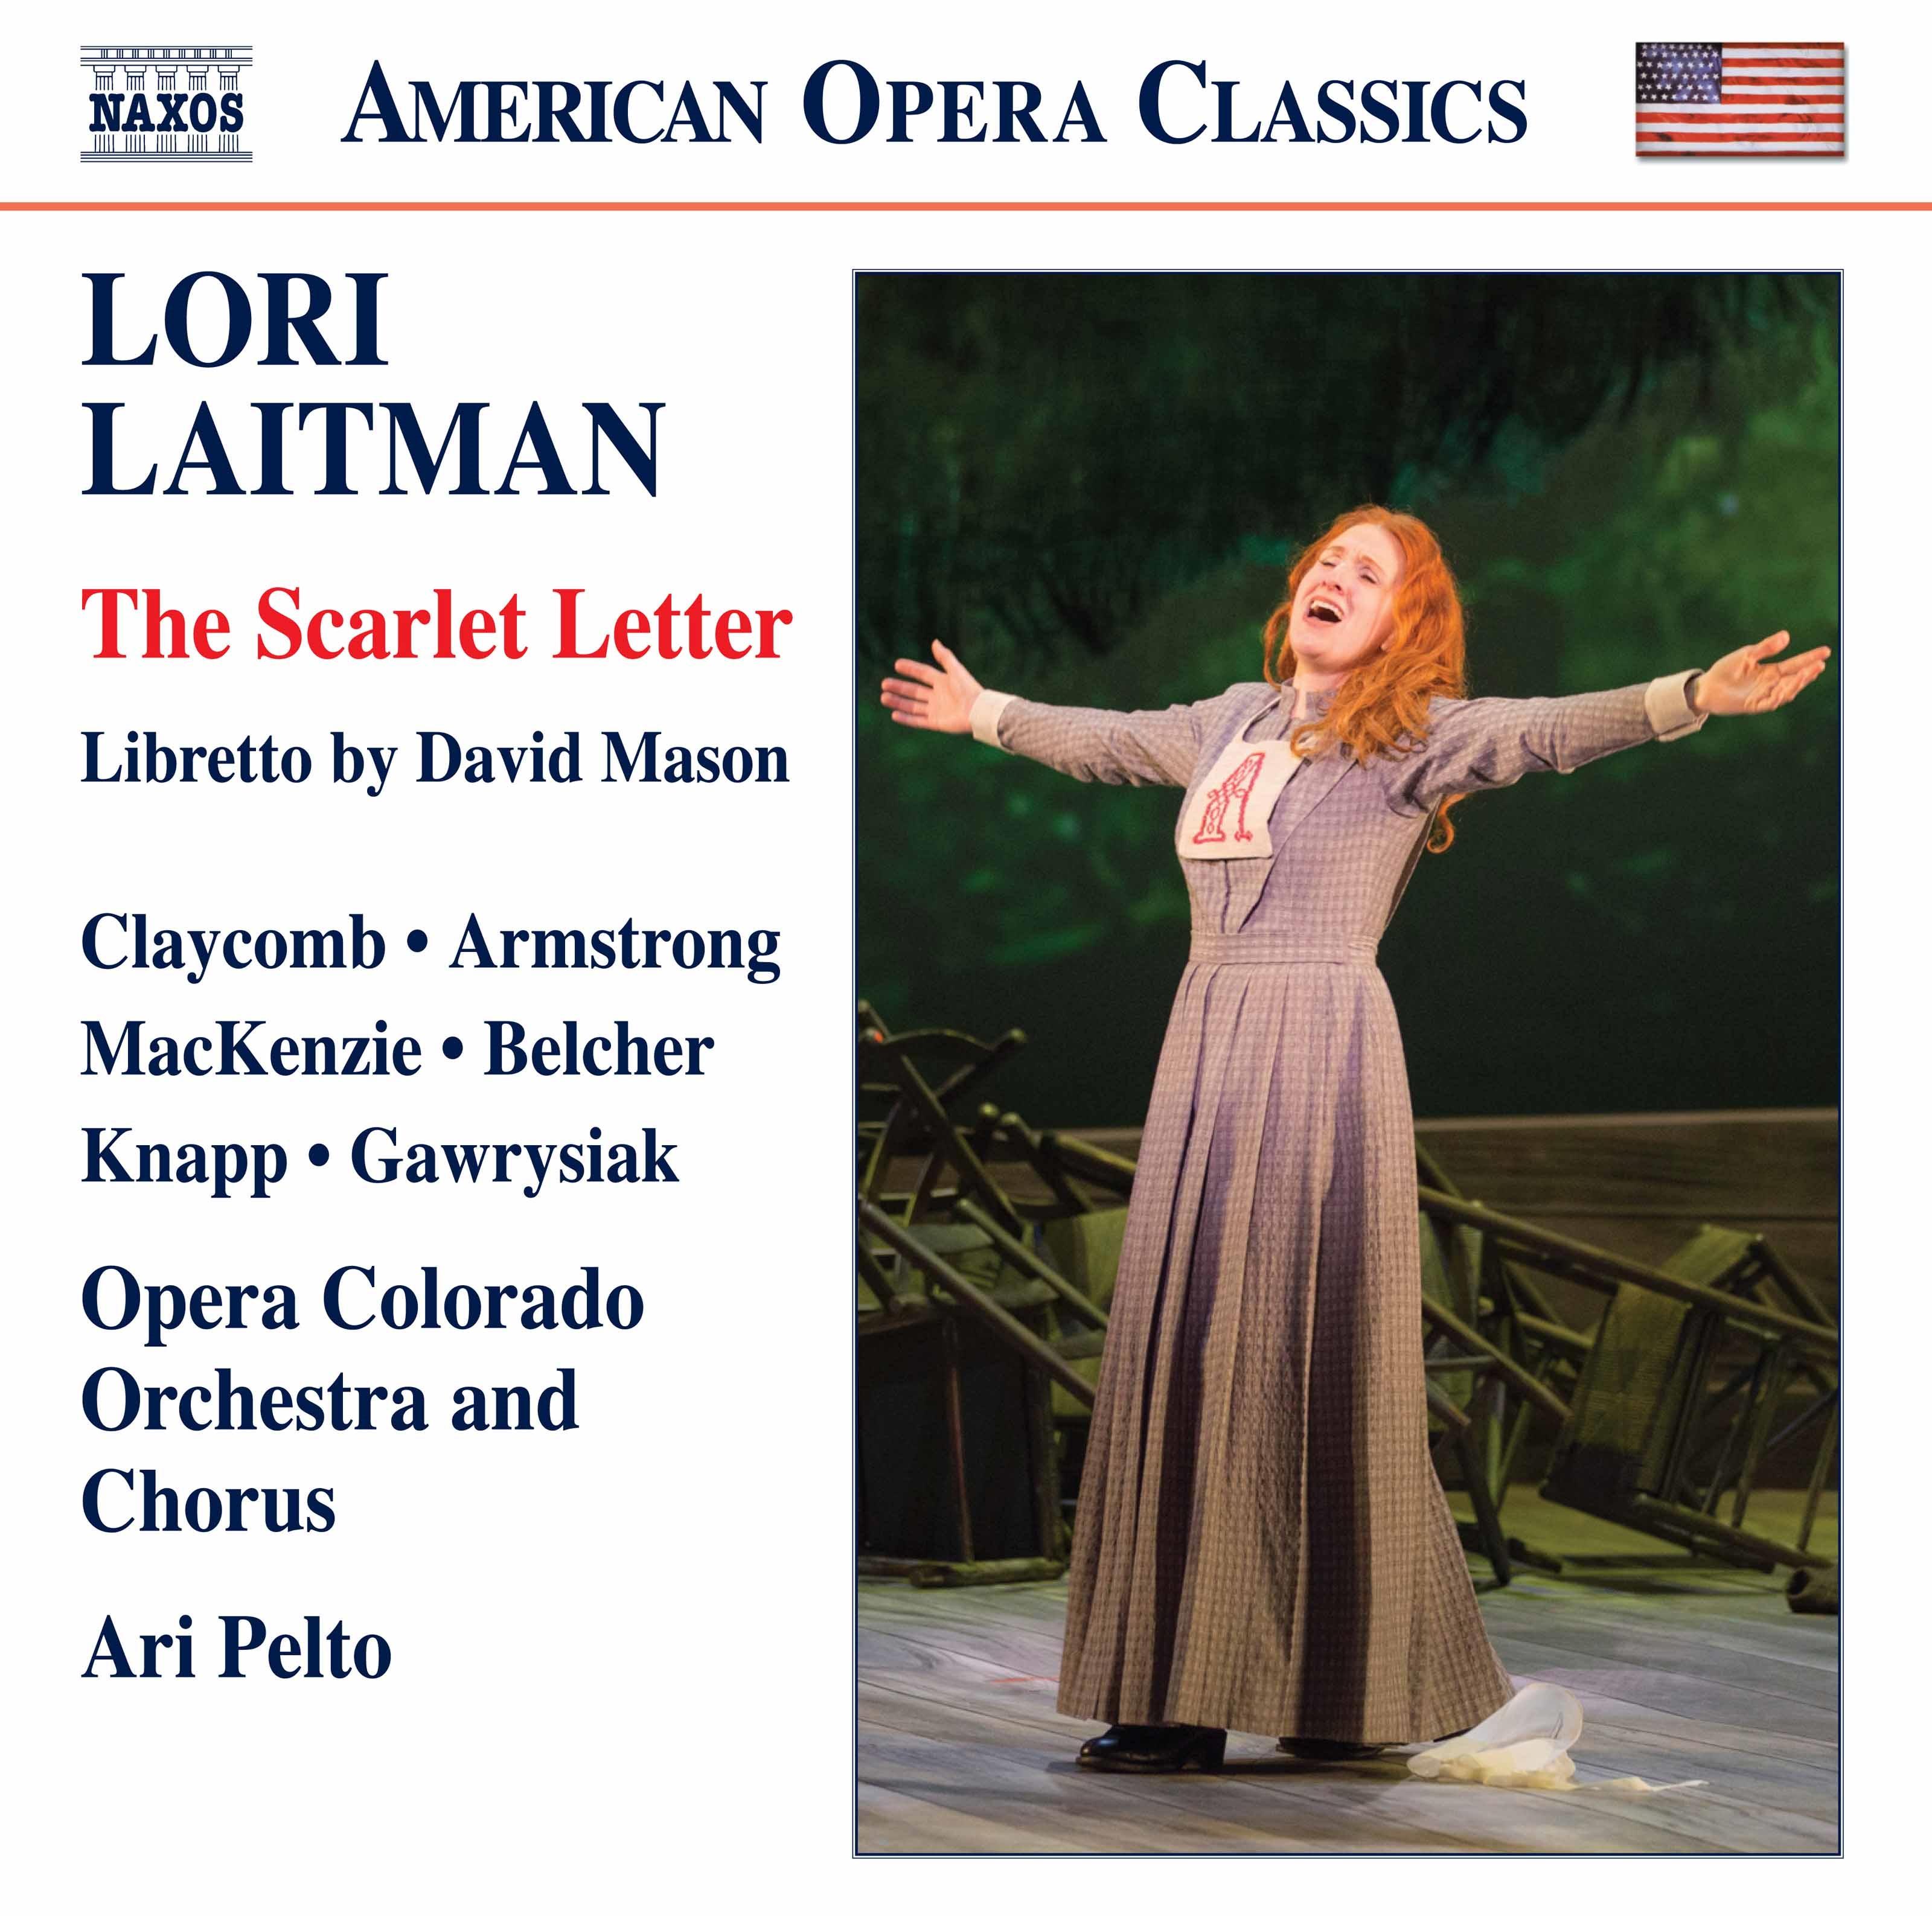 Lori Laitman The Scarlet Letter Live Classical Opera Naxos